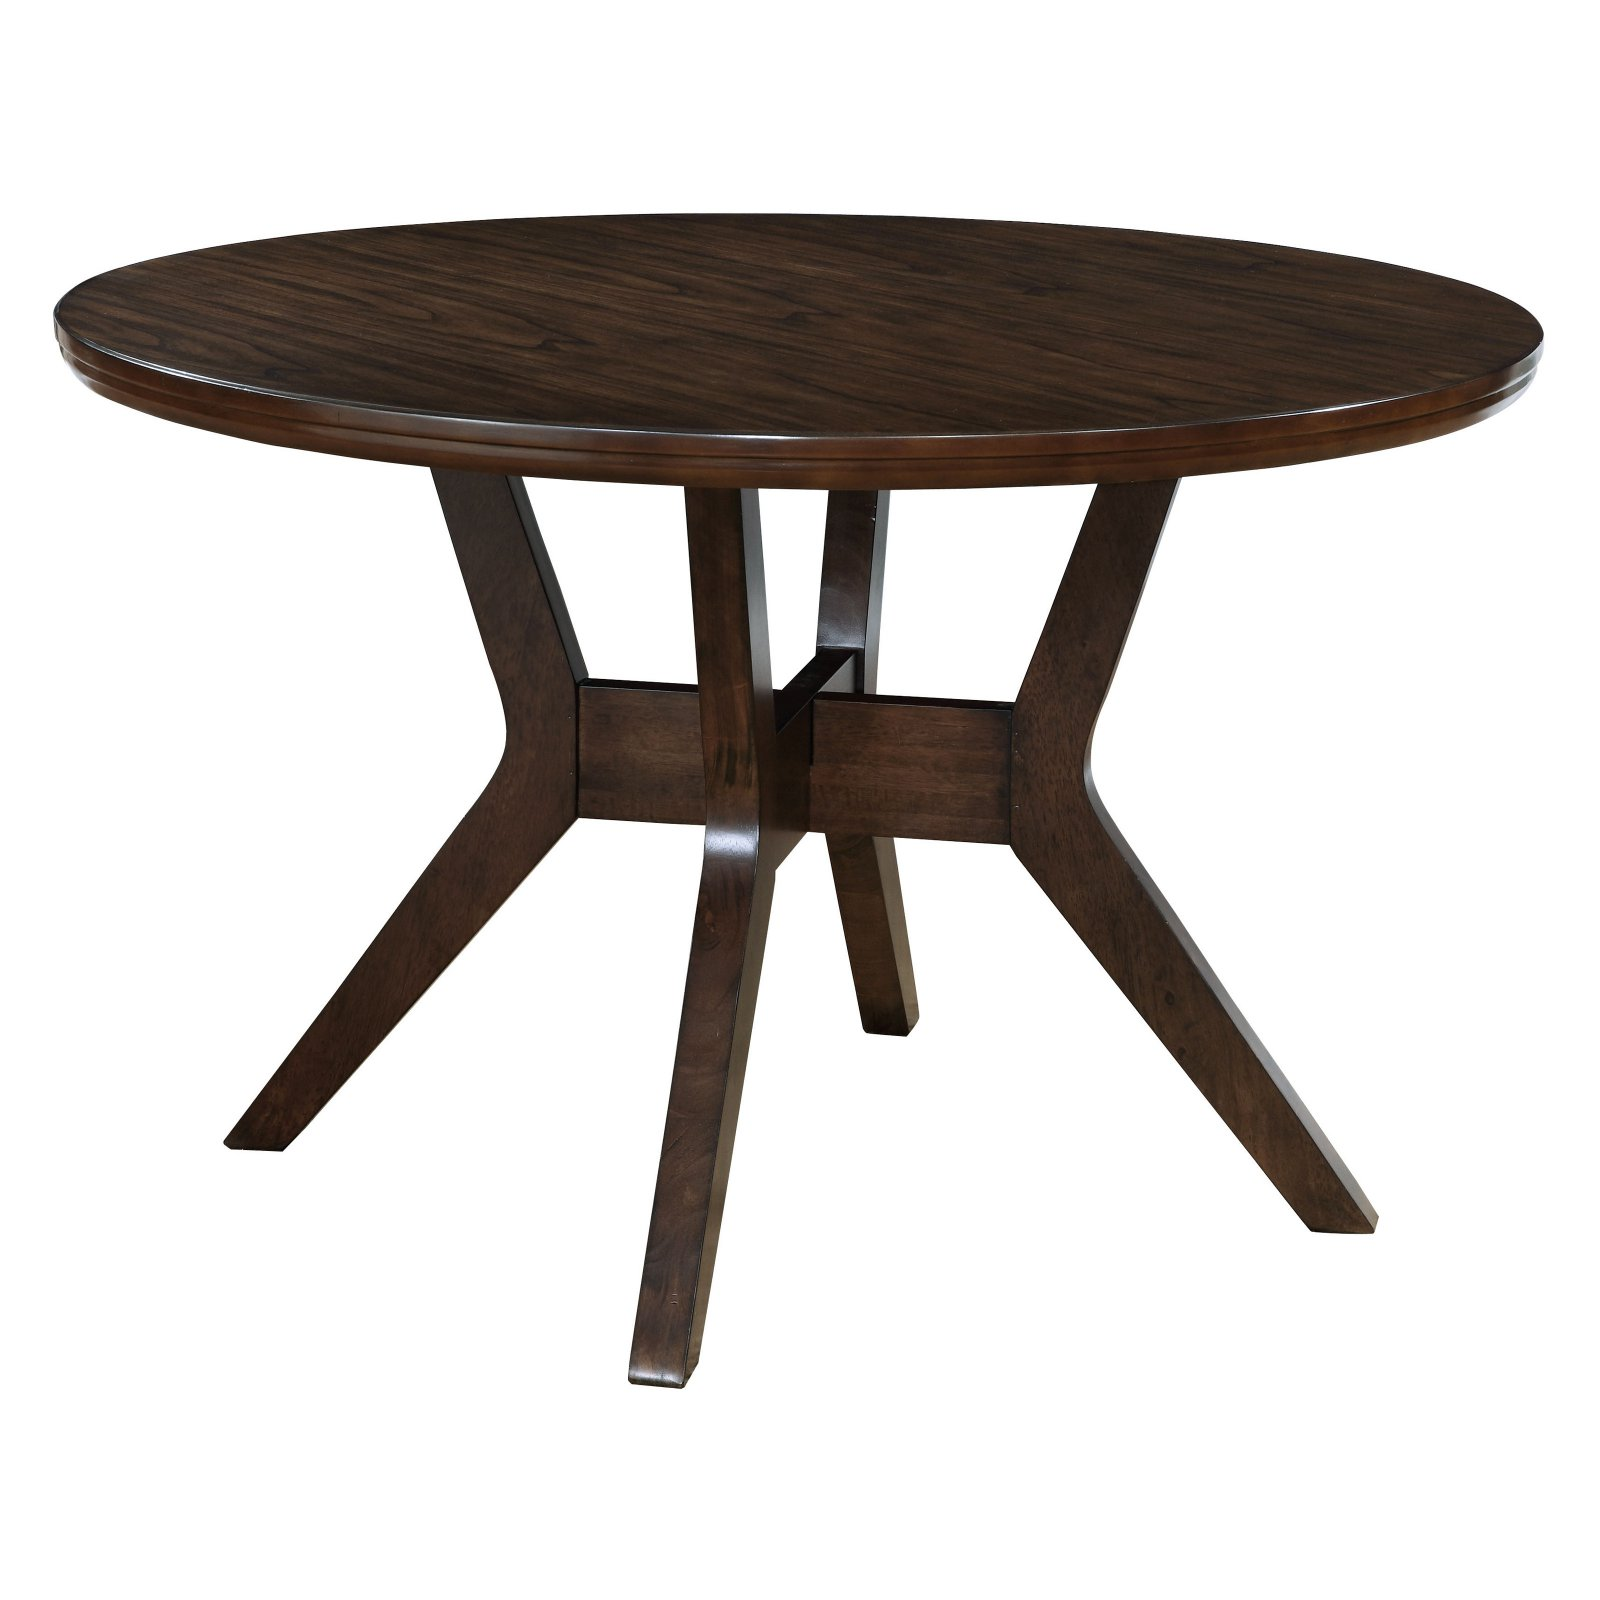 Furniture of America Wellis Mid-Century Modern Round Dining Table -  Walmart.com